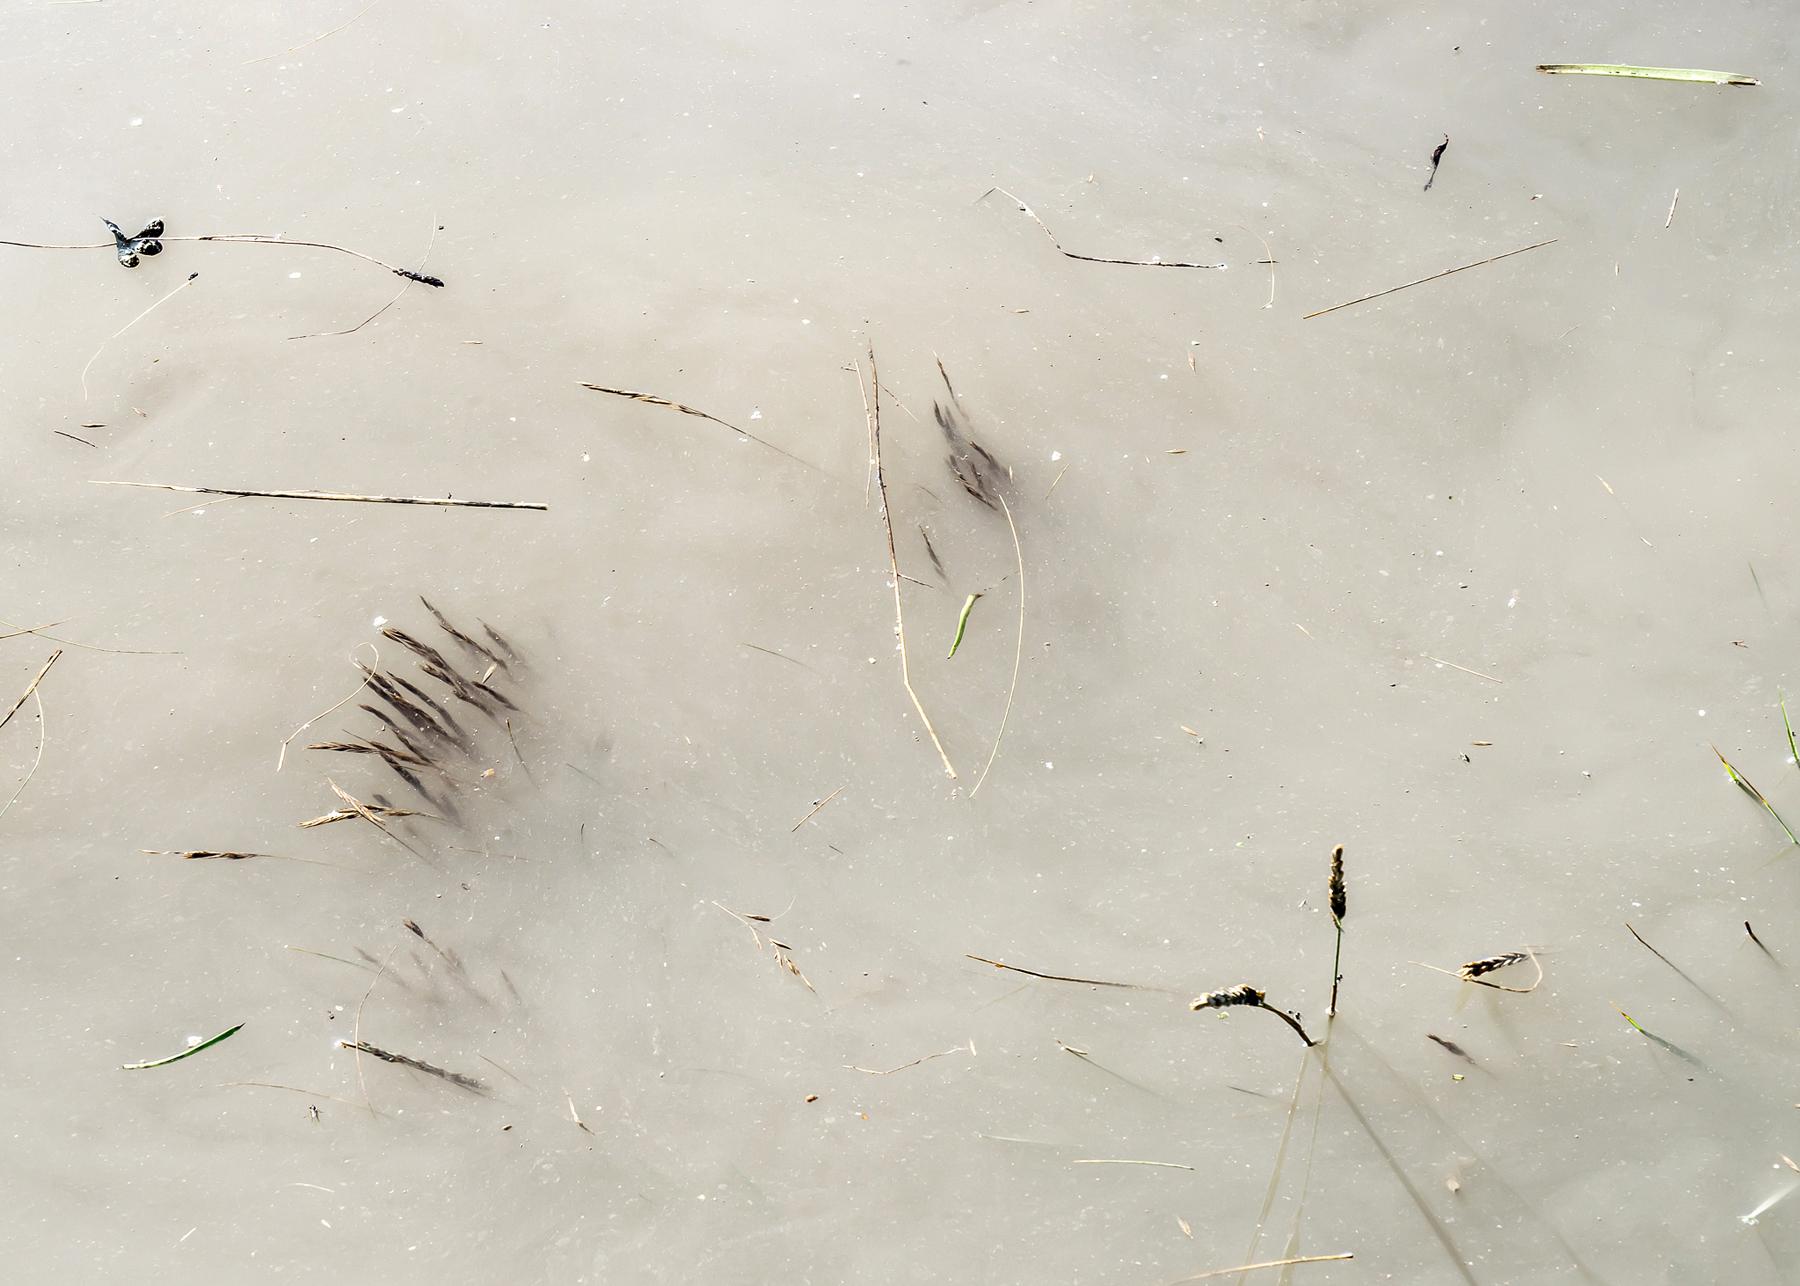 Steart Marshes, Summer